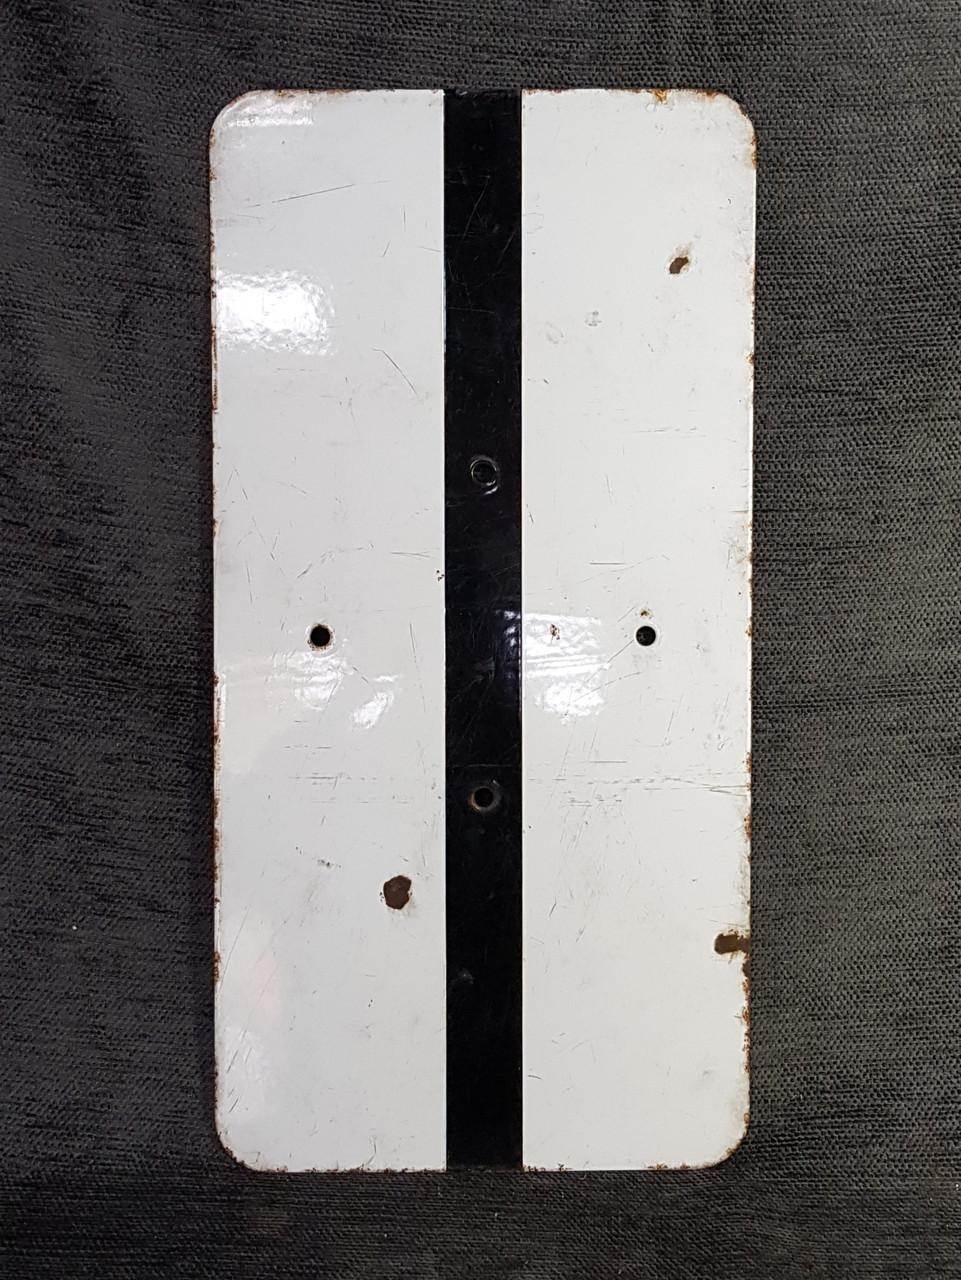 VT 2200. ENAMEL INTERMEDIATE SIGNAL IDENTIFICATION PLATE